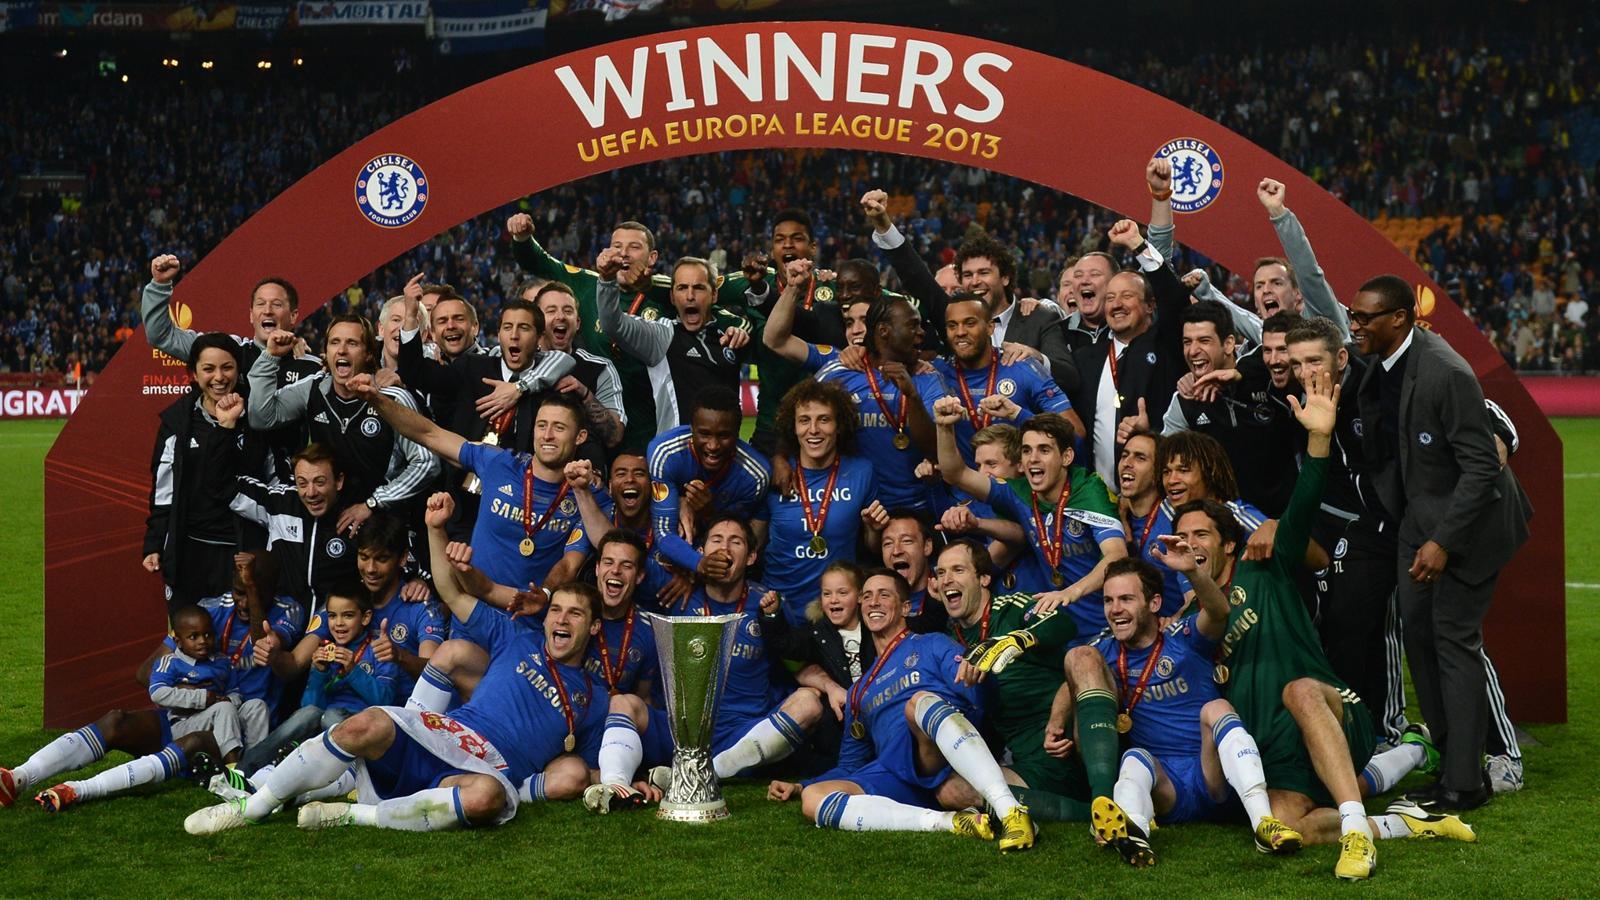 Europa League Champions League Spot